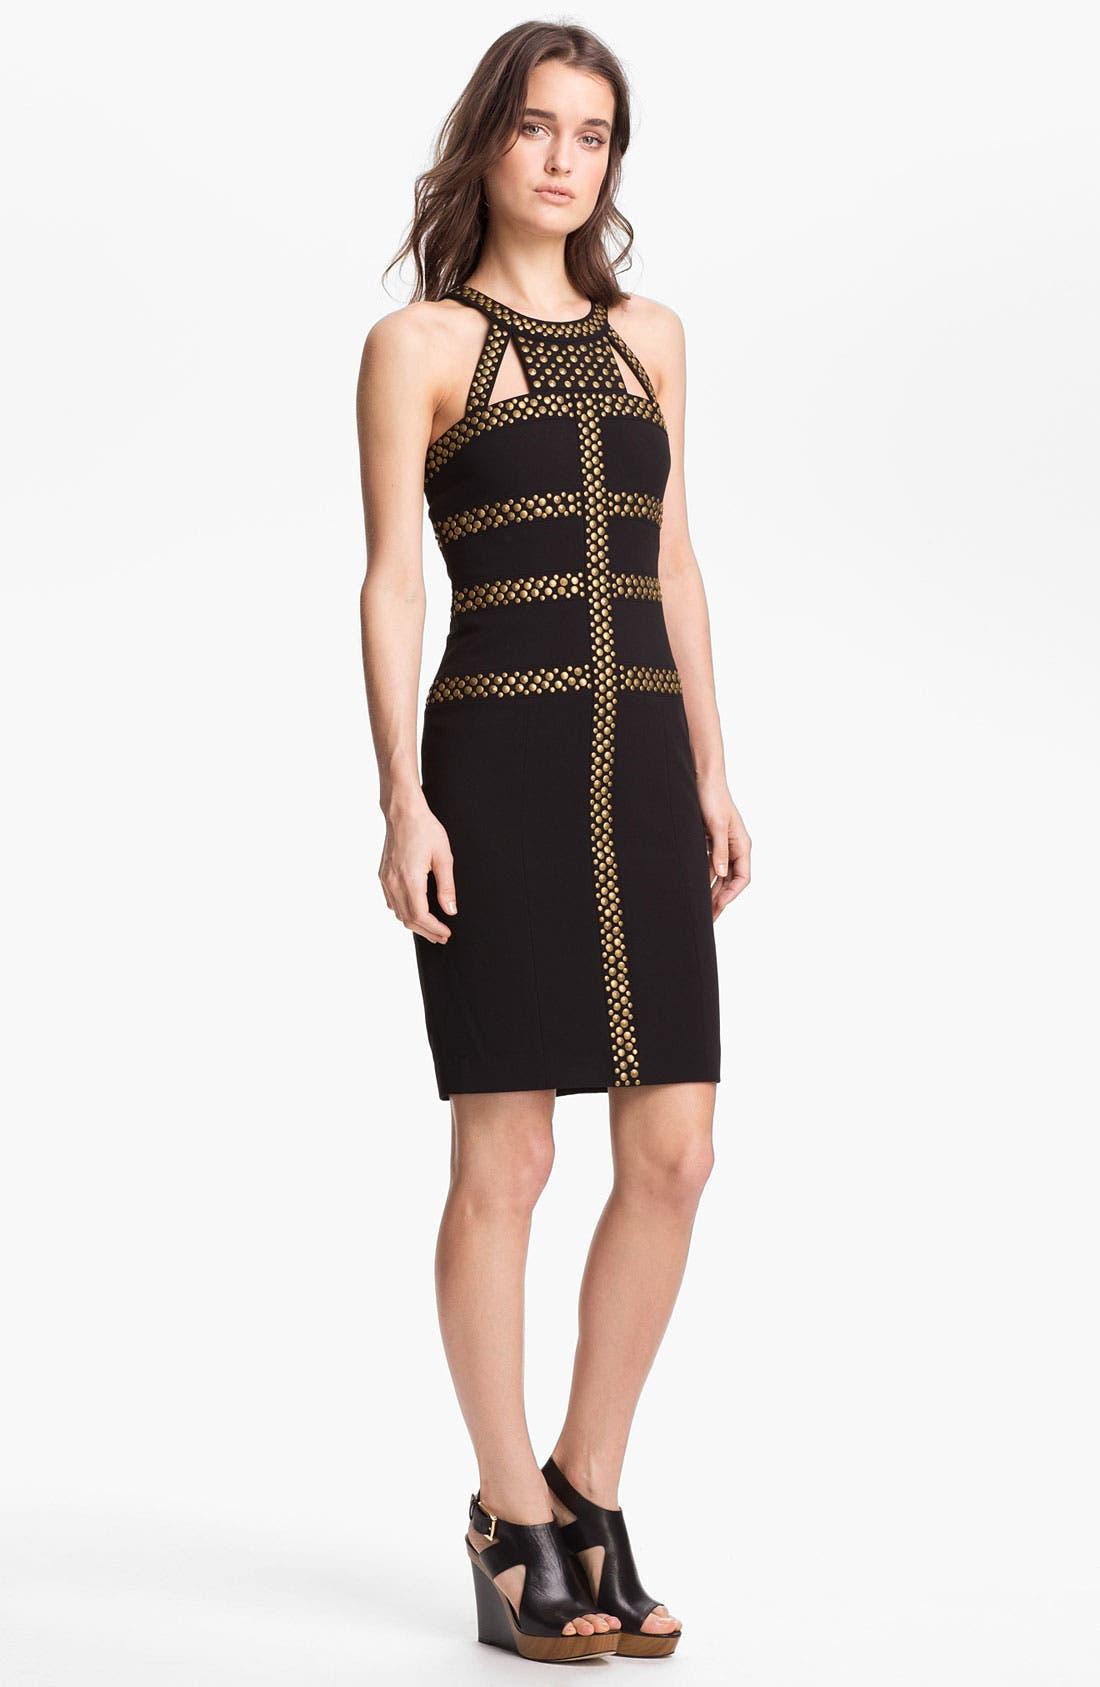 Main Image - BCBGMAXAZRIA Studded Sheath Dress